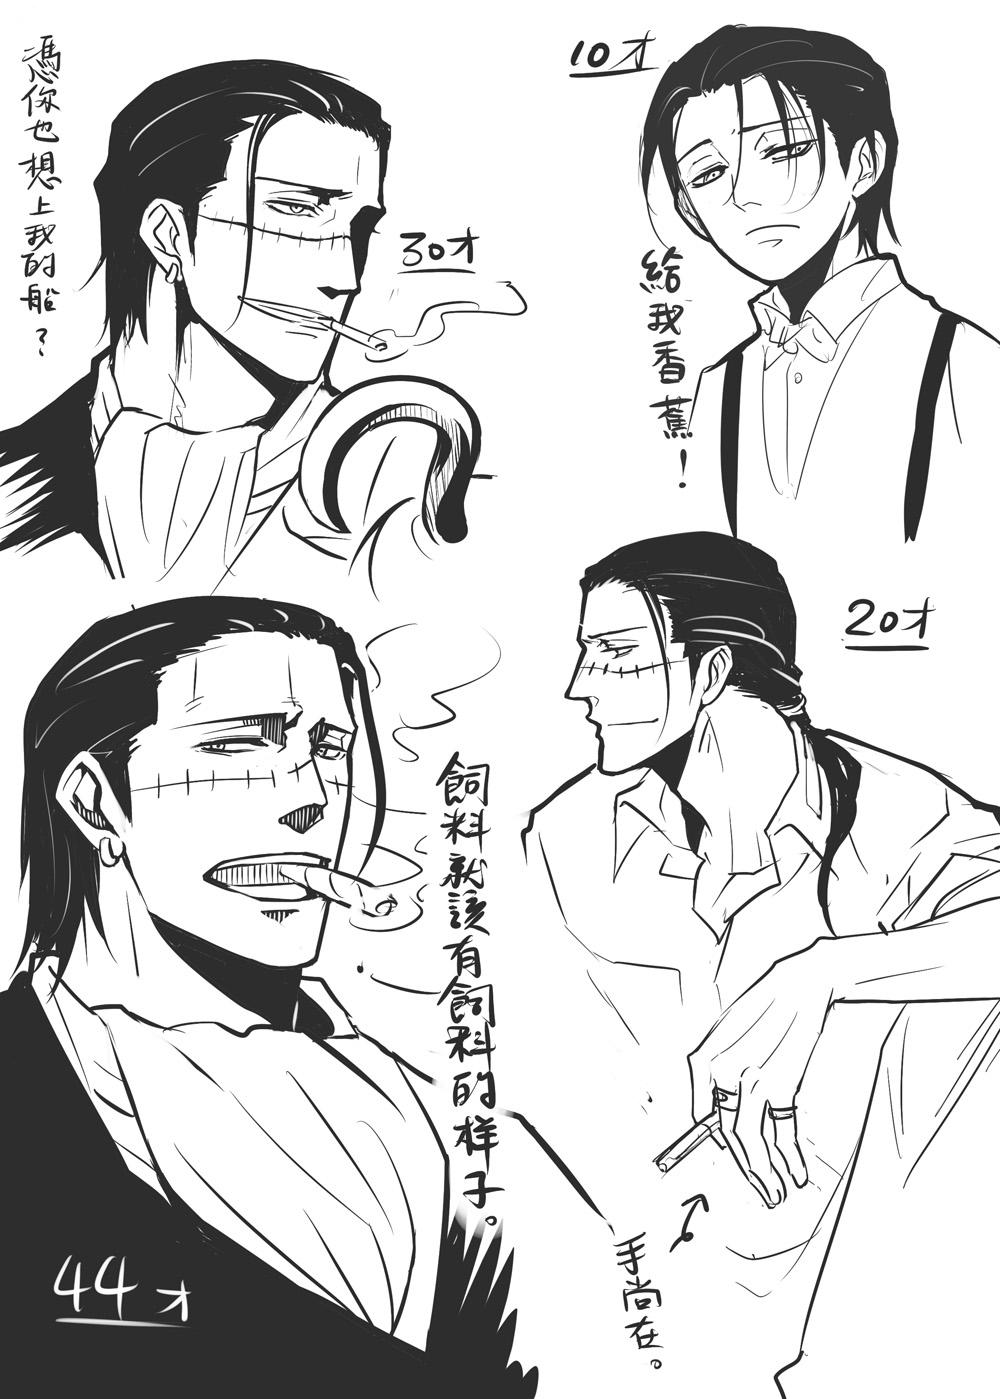 Sir Crocodile - ONE PIECE | page 2 of 12 - Zerochan Anime ...